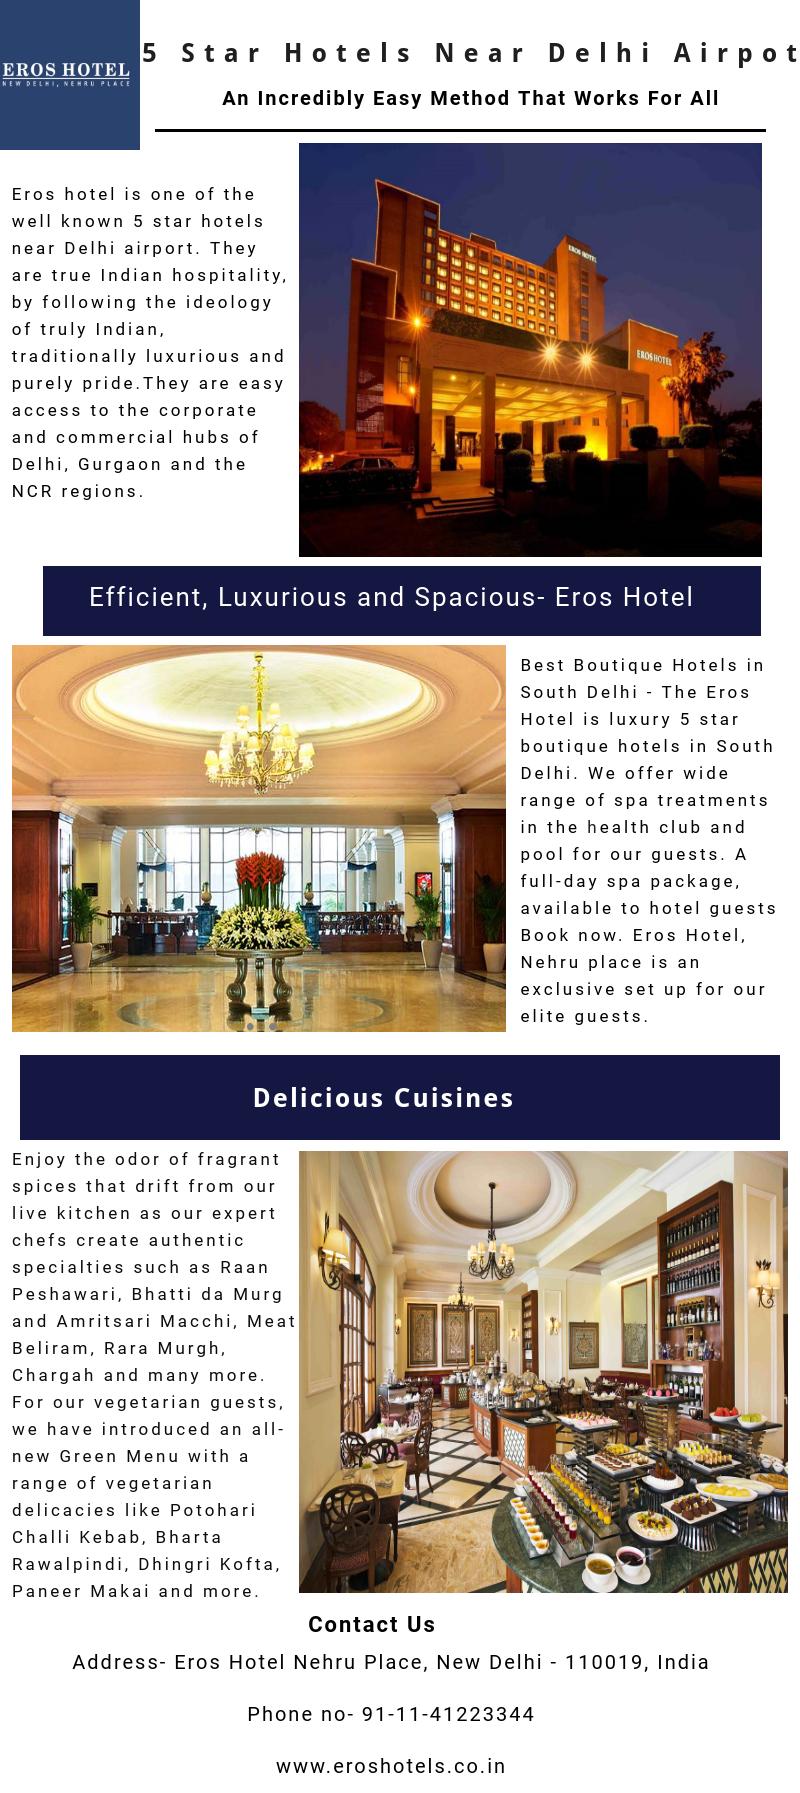 5 Star Hotels Near Delhi Airport 5 Star Restaurants In